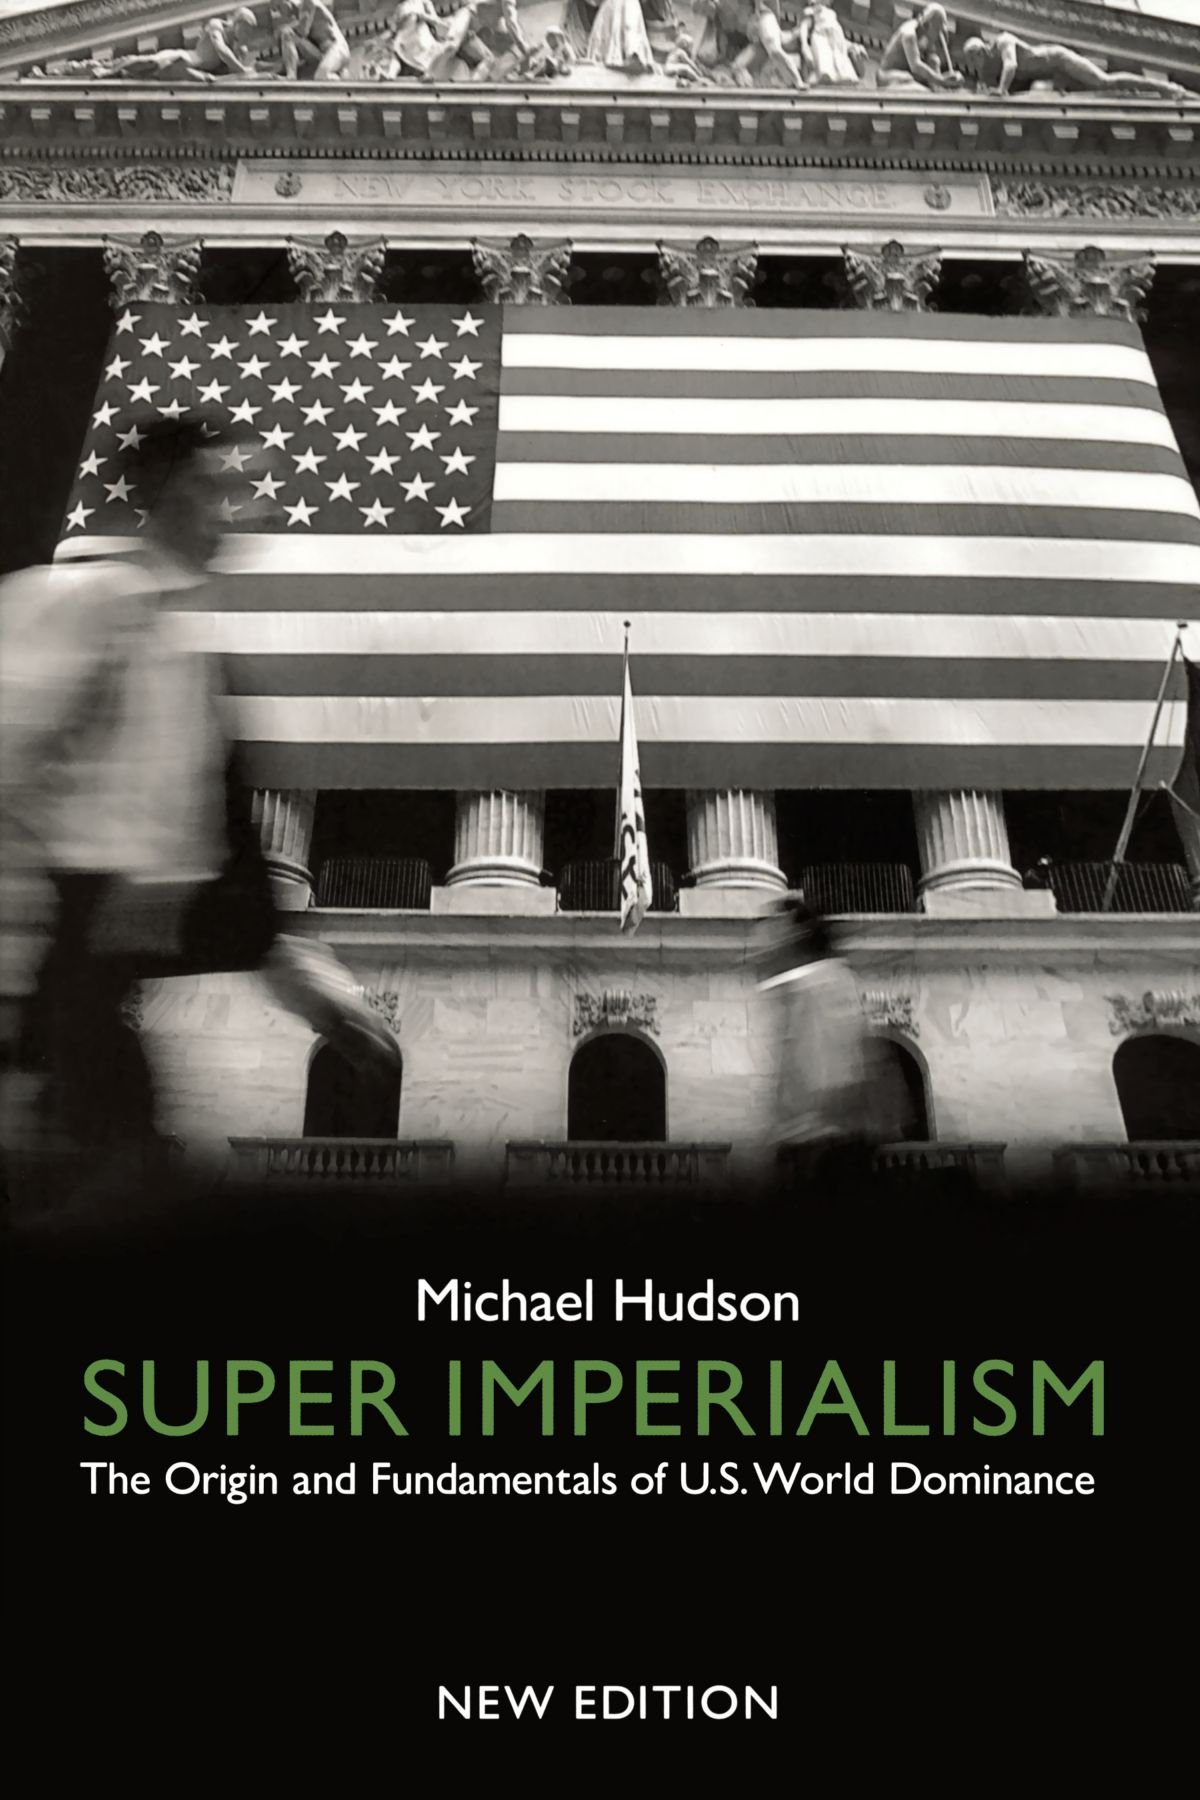 Super Imperialism: The Origin and Fundamentals of U.S. World Dominance